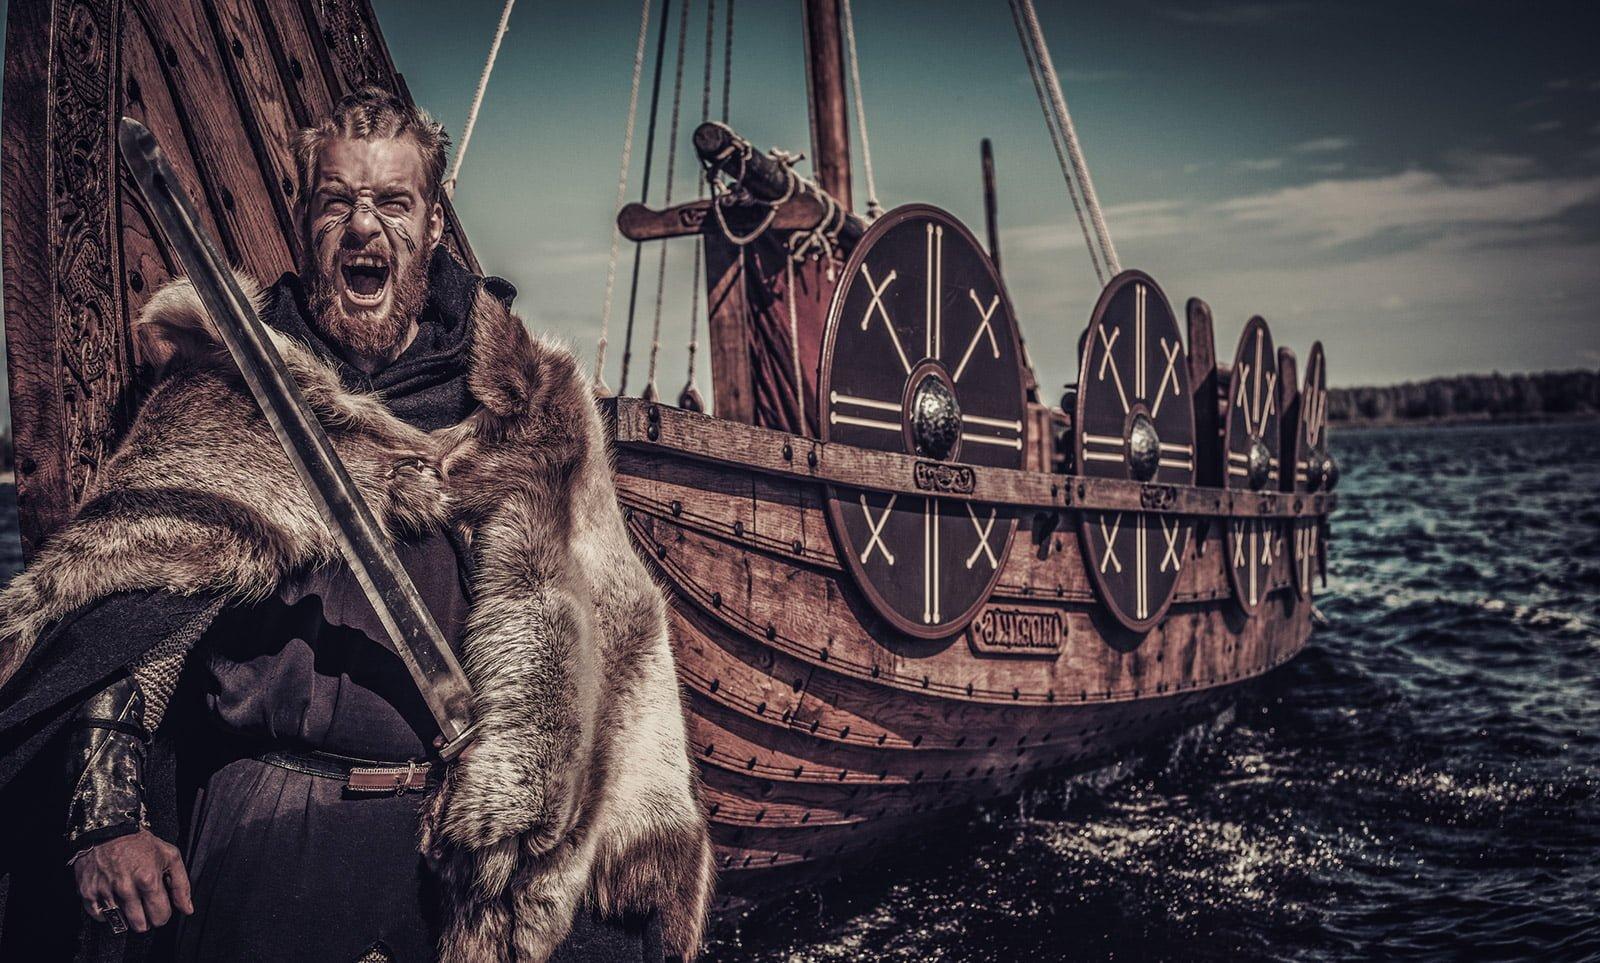 Viking DNA concept image